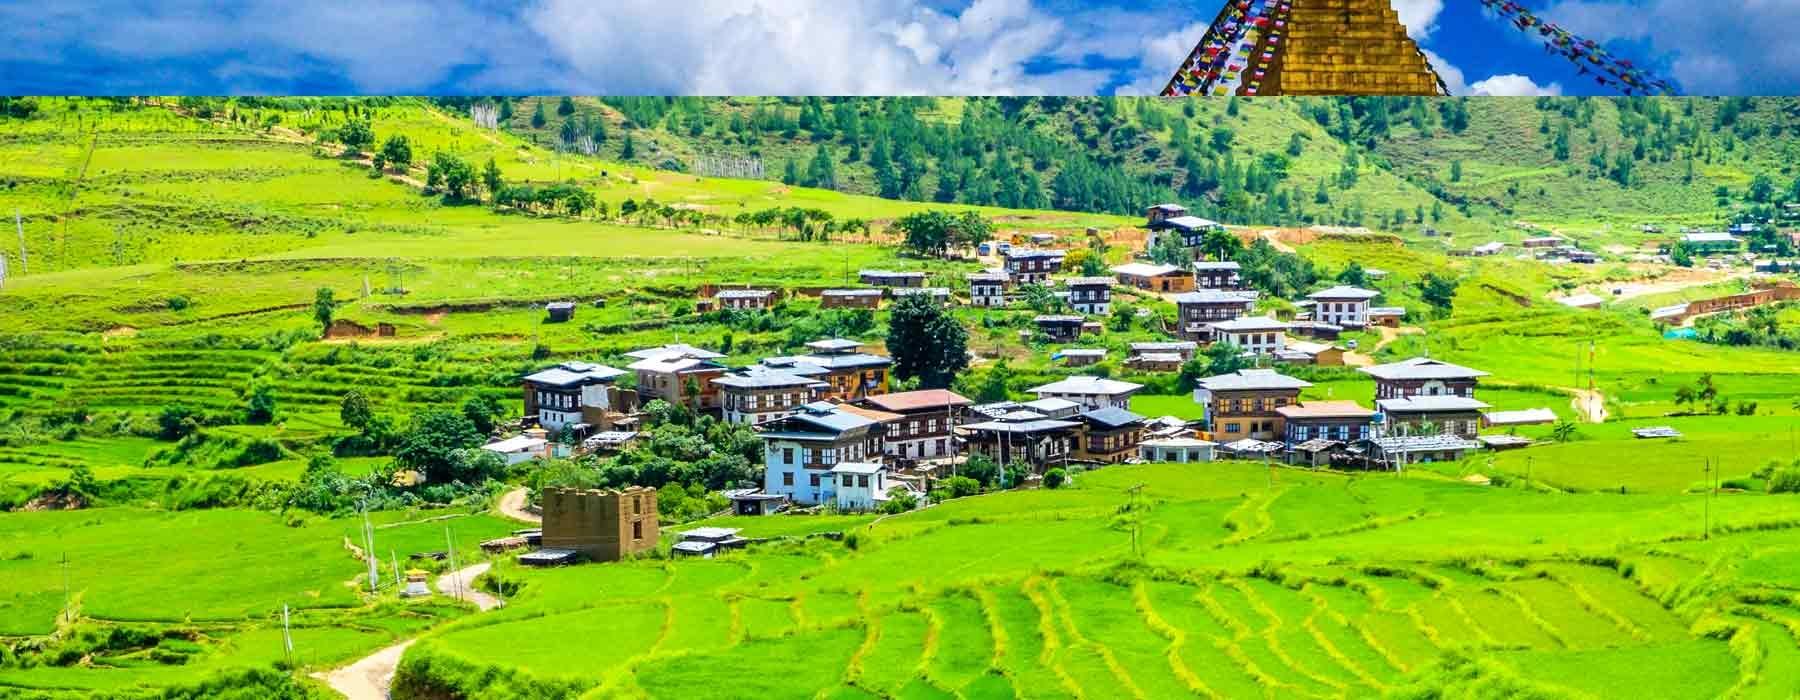 nepal tour (@tourpackagefornepal1) Cover Image